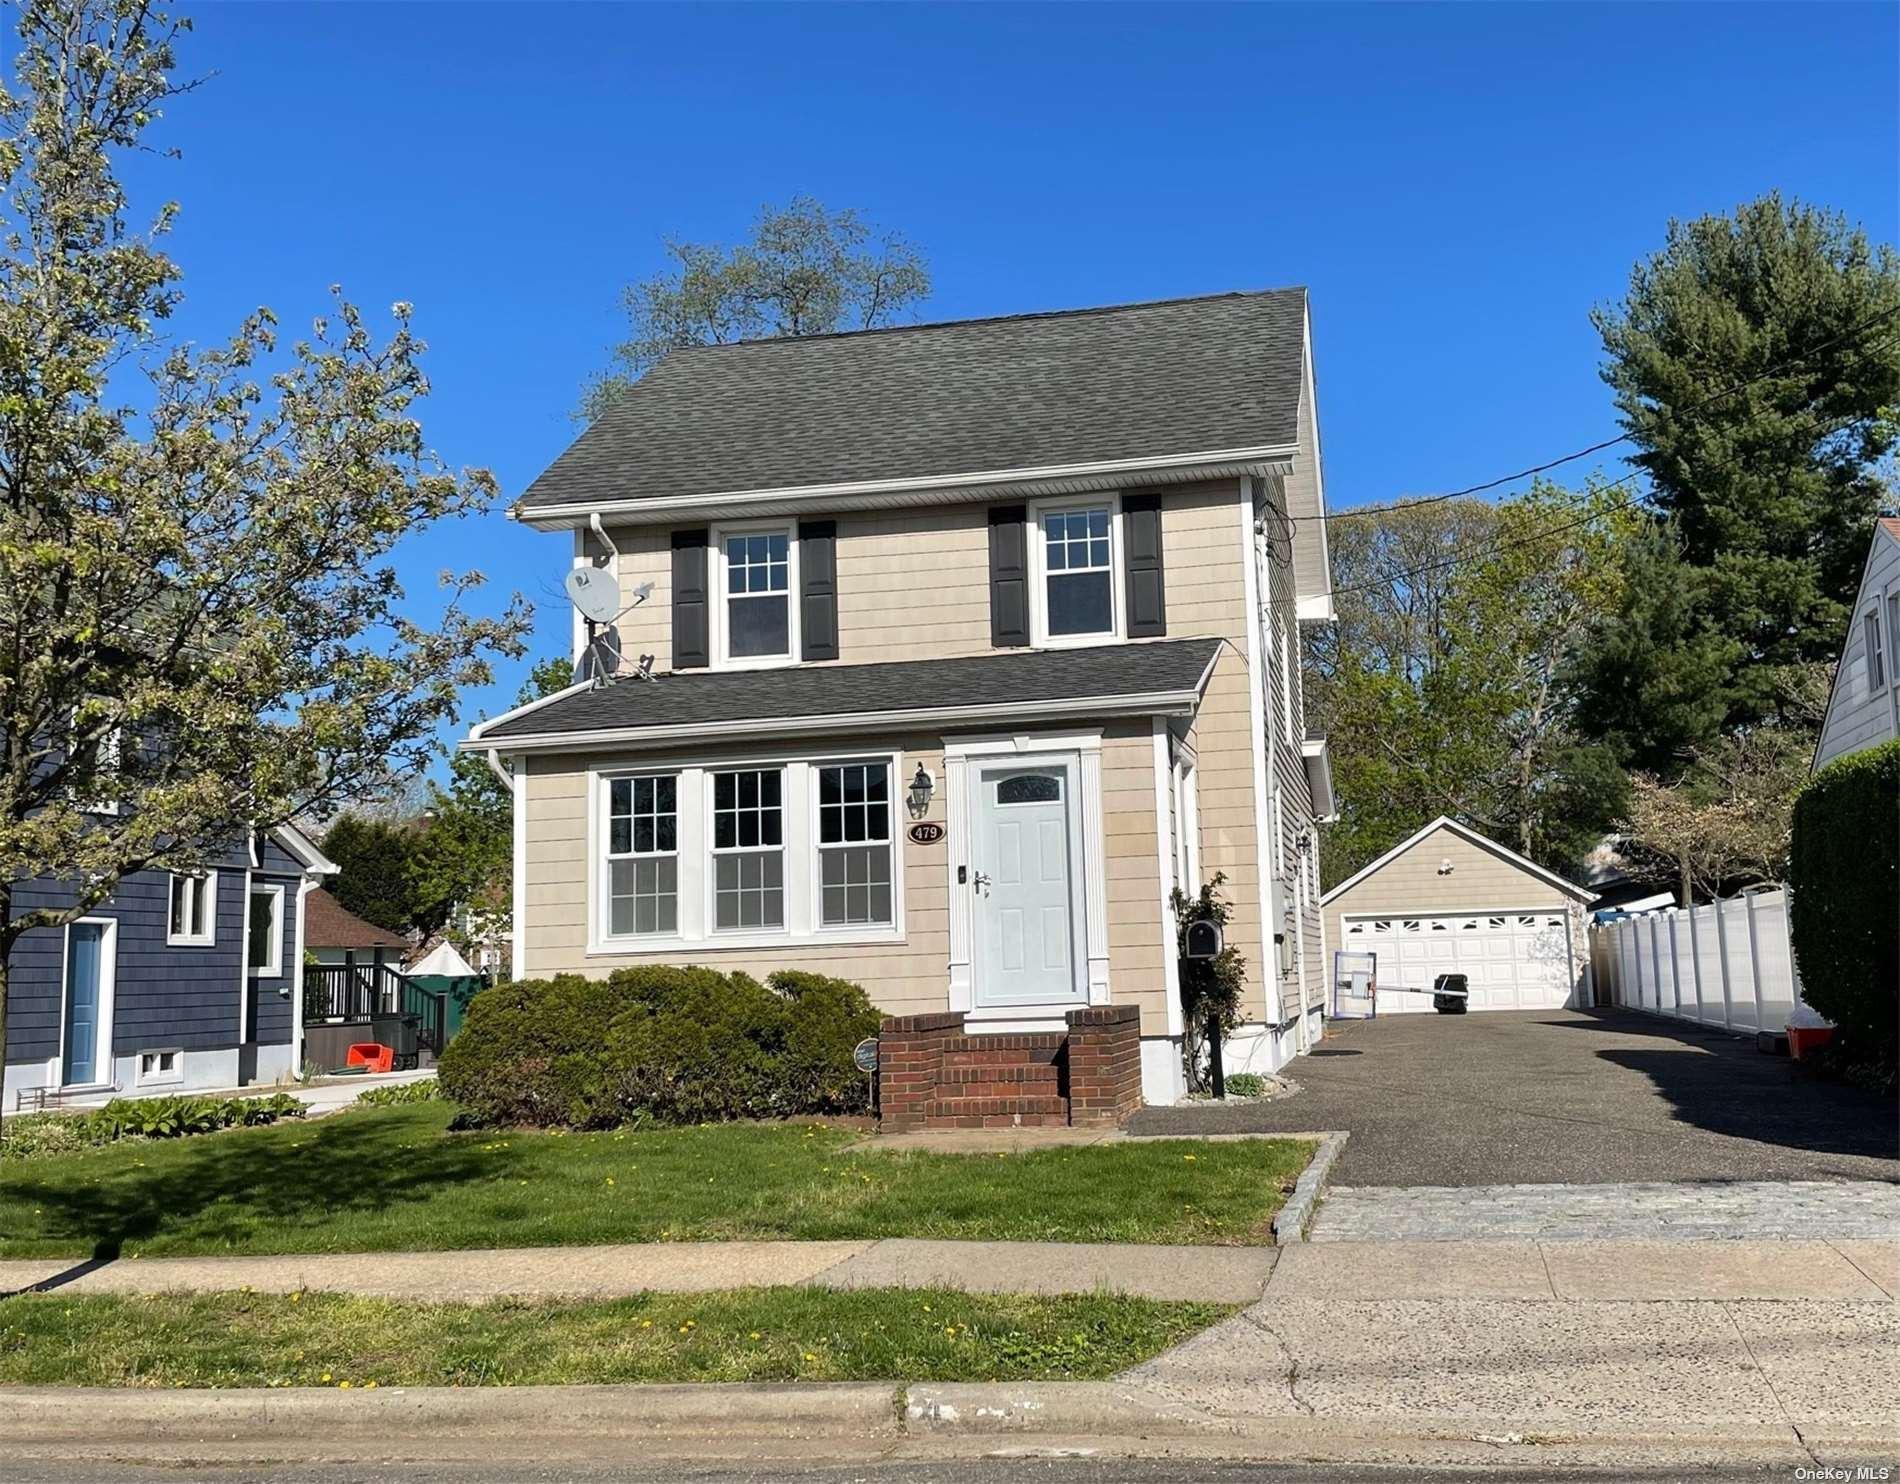 479 Locust Terrace, West Hempstead, NY 11552 - MLS#: 3308784